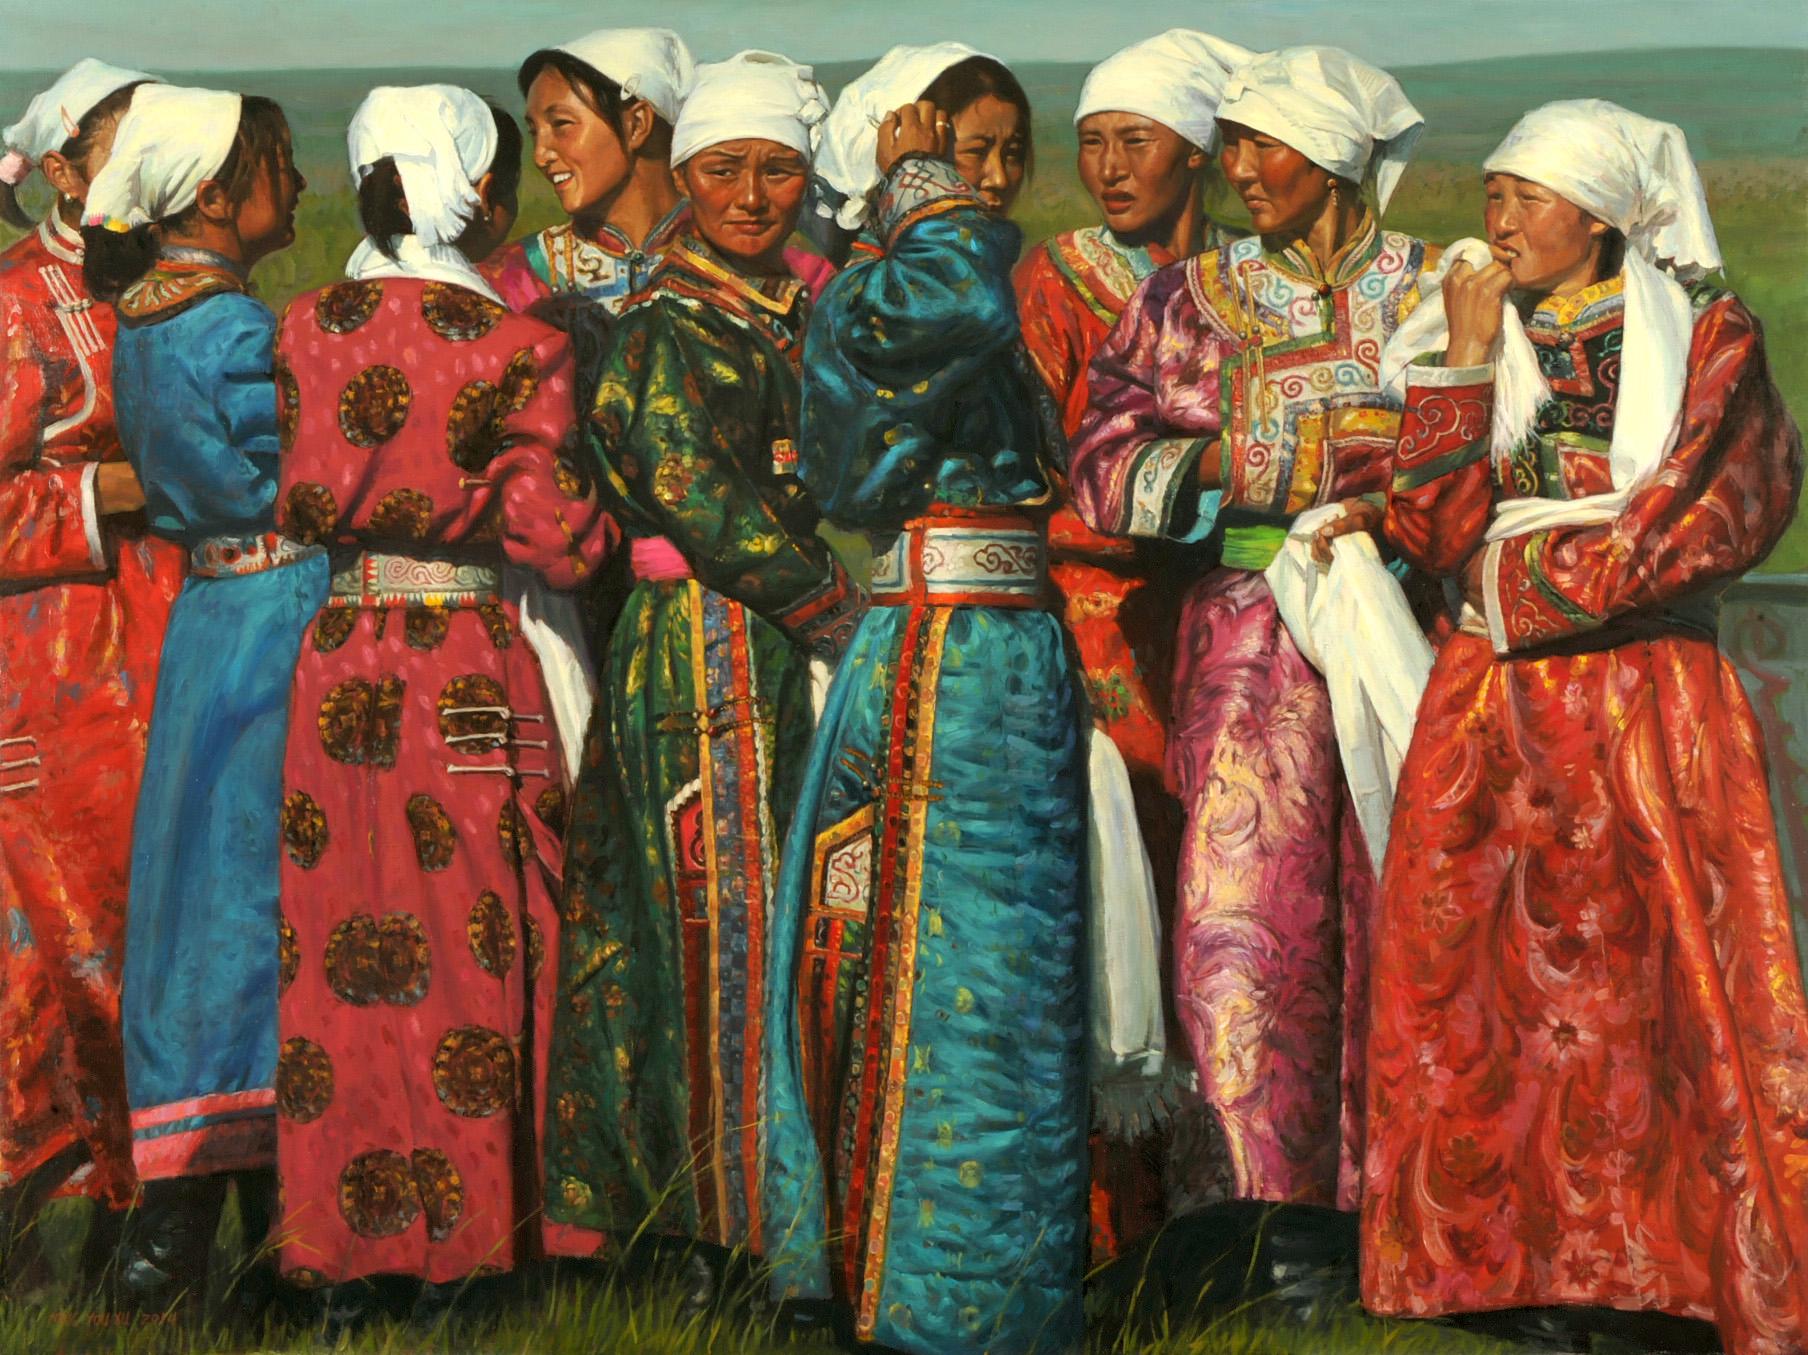 White Headscarves